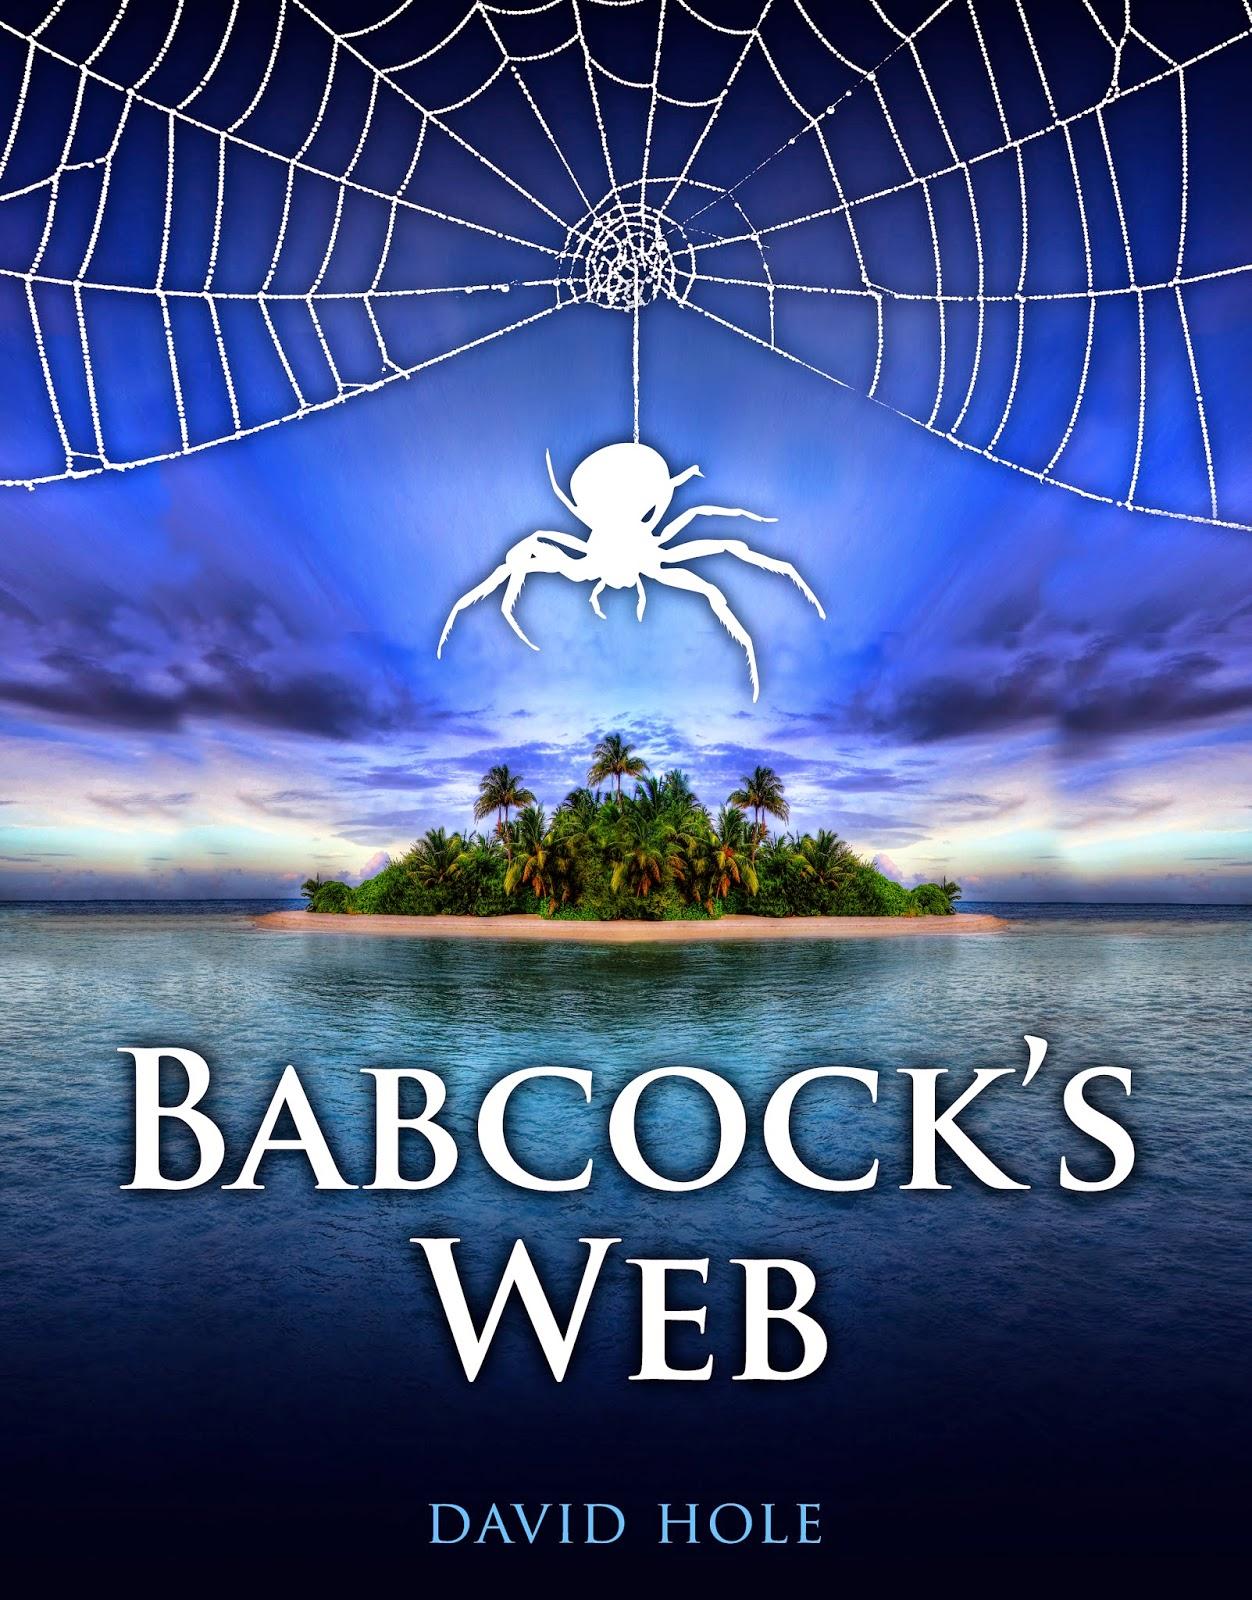 hunger games fifty shades of gray babcock's web